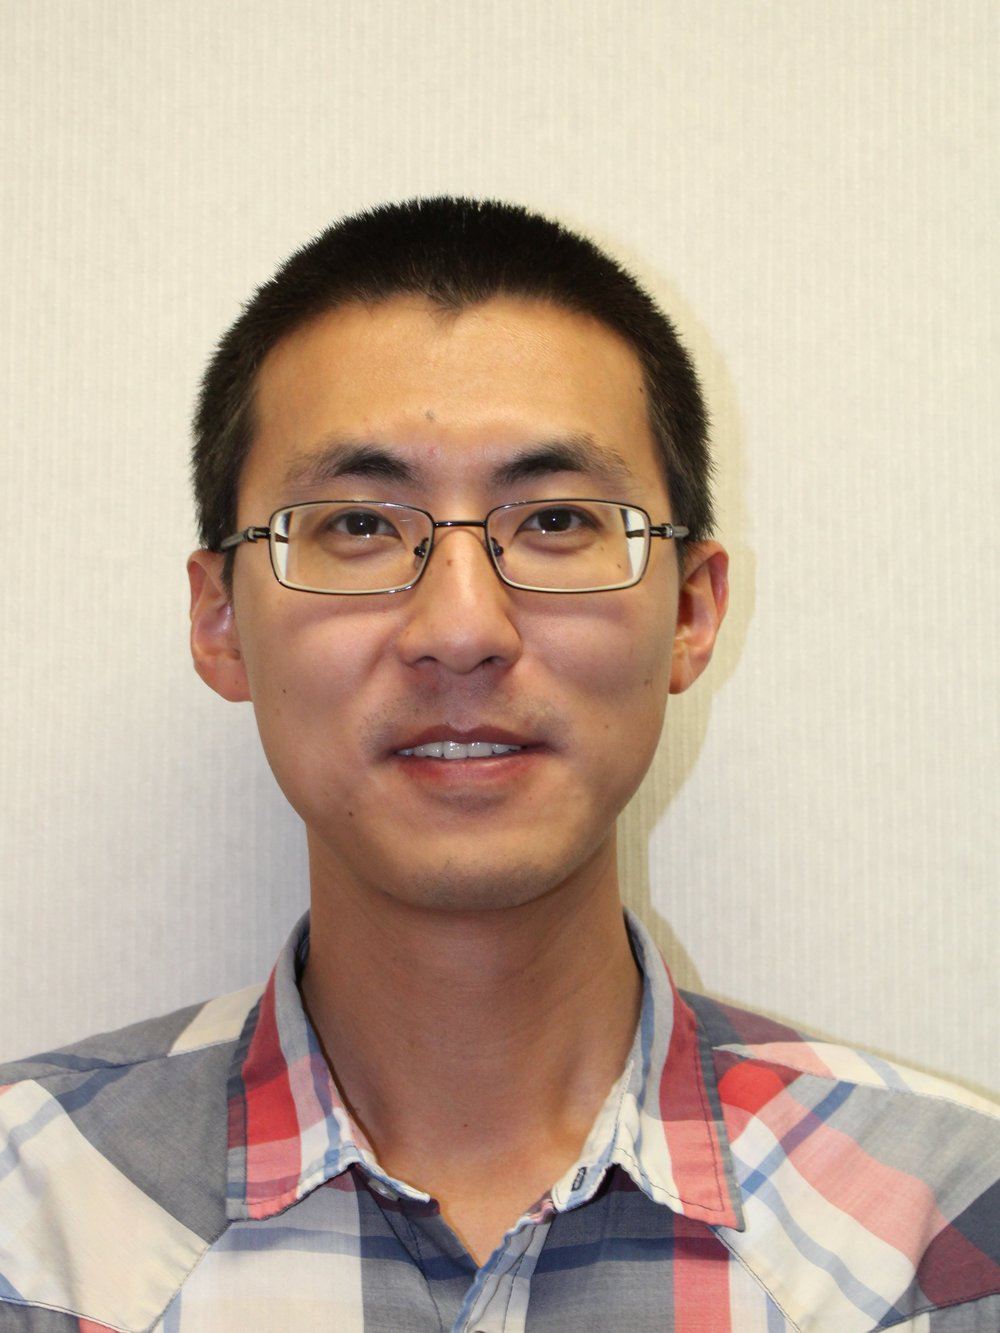 EDUCATION  B.Eng. Geomatics, Wuhan University, China (2007)  Ph.D. Photogrammetry and Remote Sensing, Peking University, China (2012)